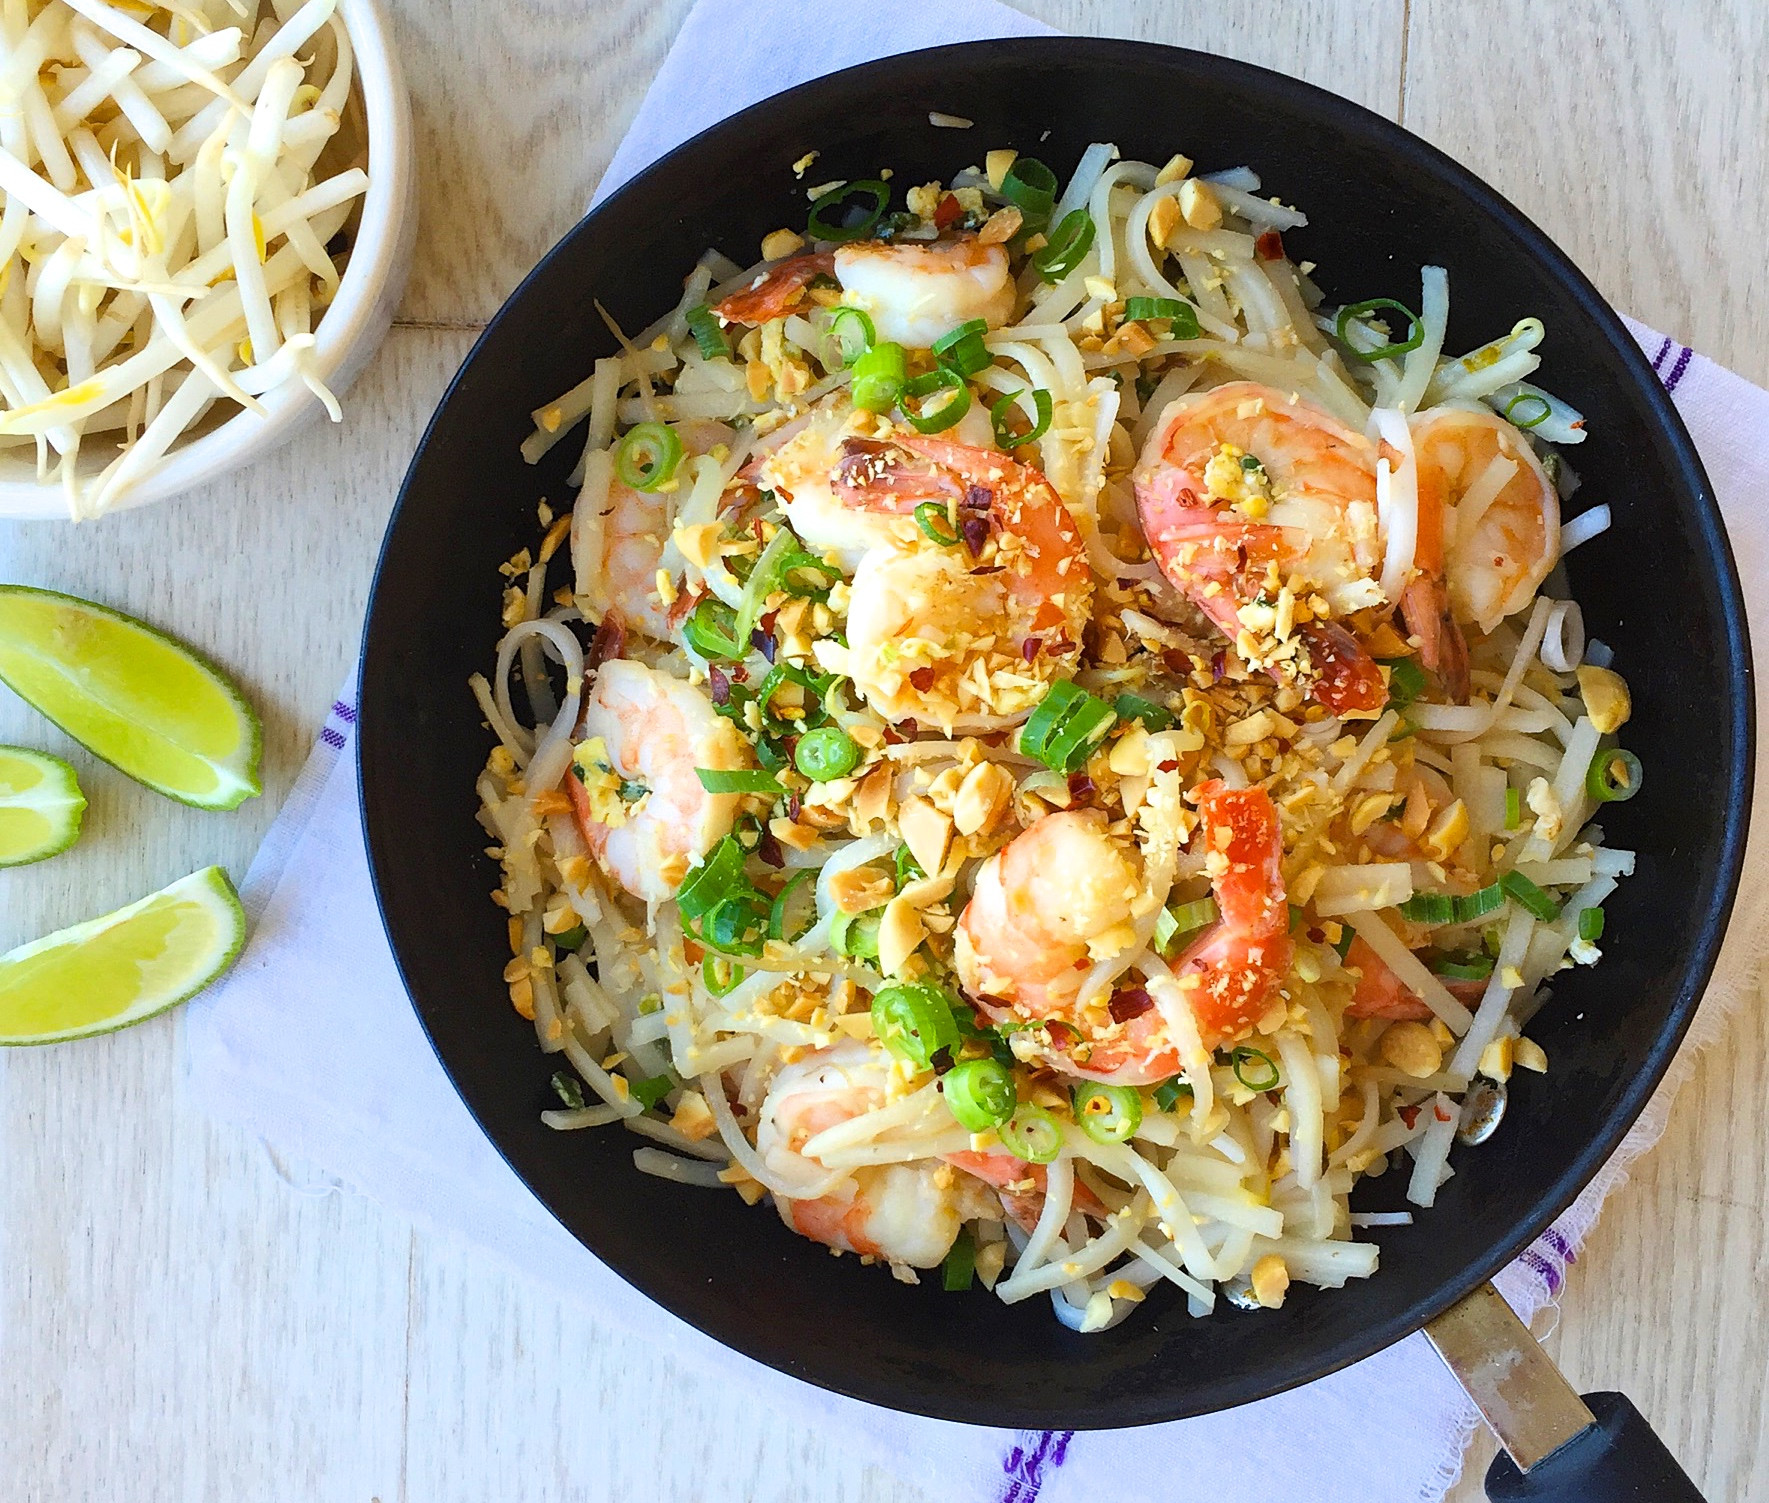 Healthy Shrimp Pad Thai Recipe  Best Easy Shrimp Pad Thai Recipe How to Make Easy Shrimp